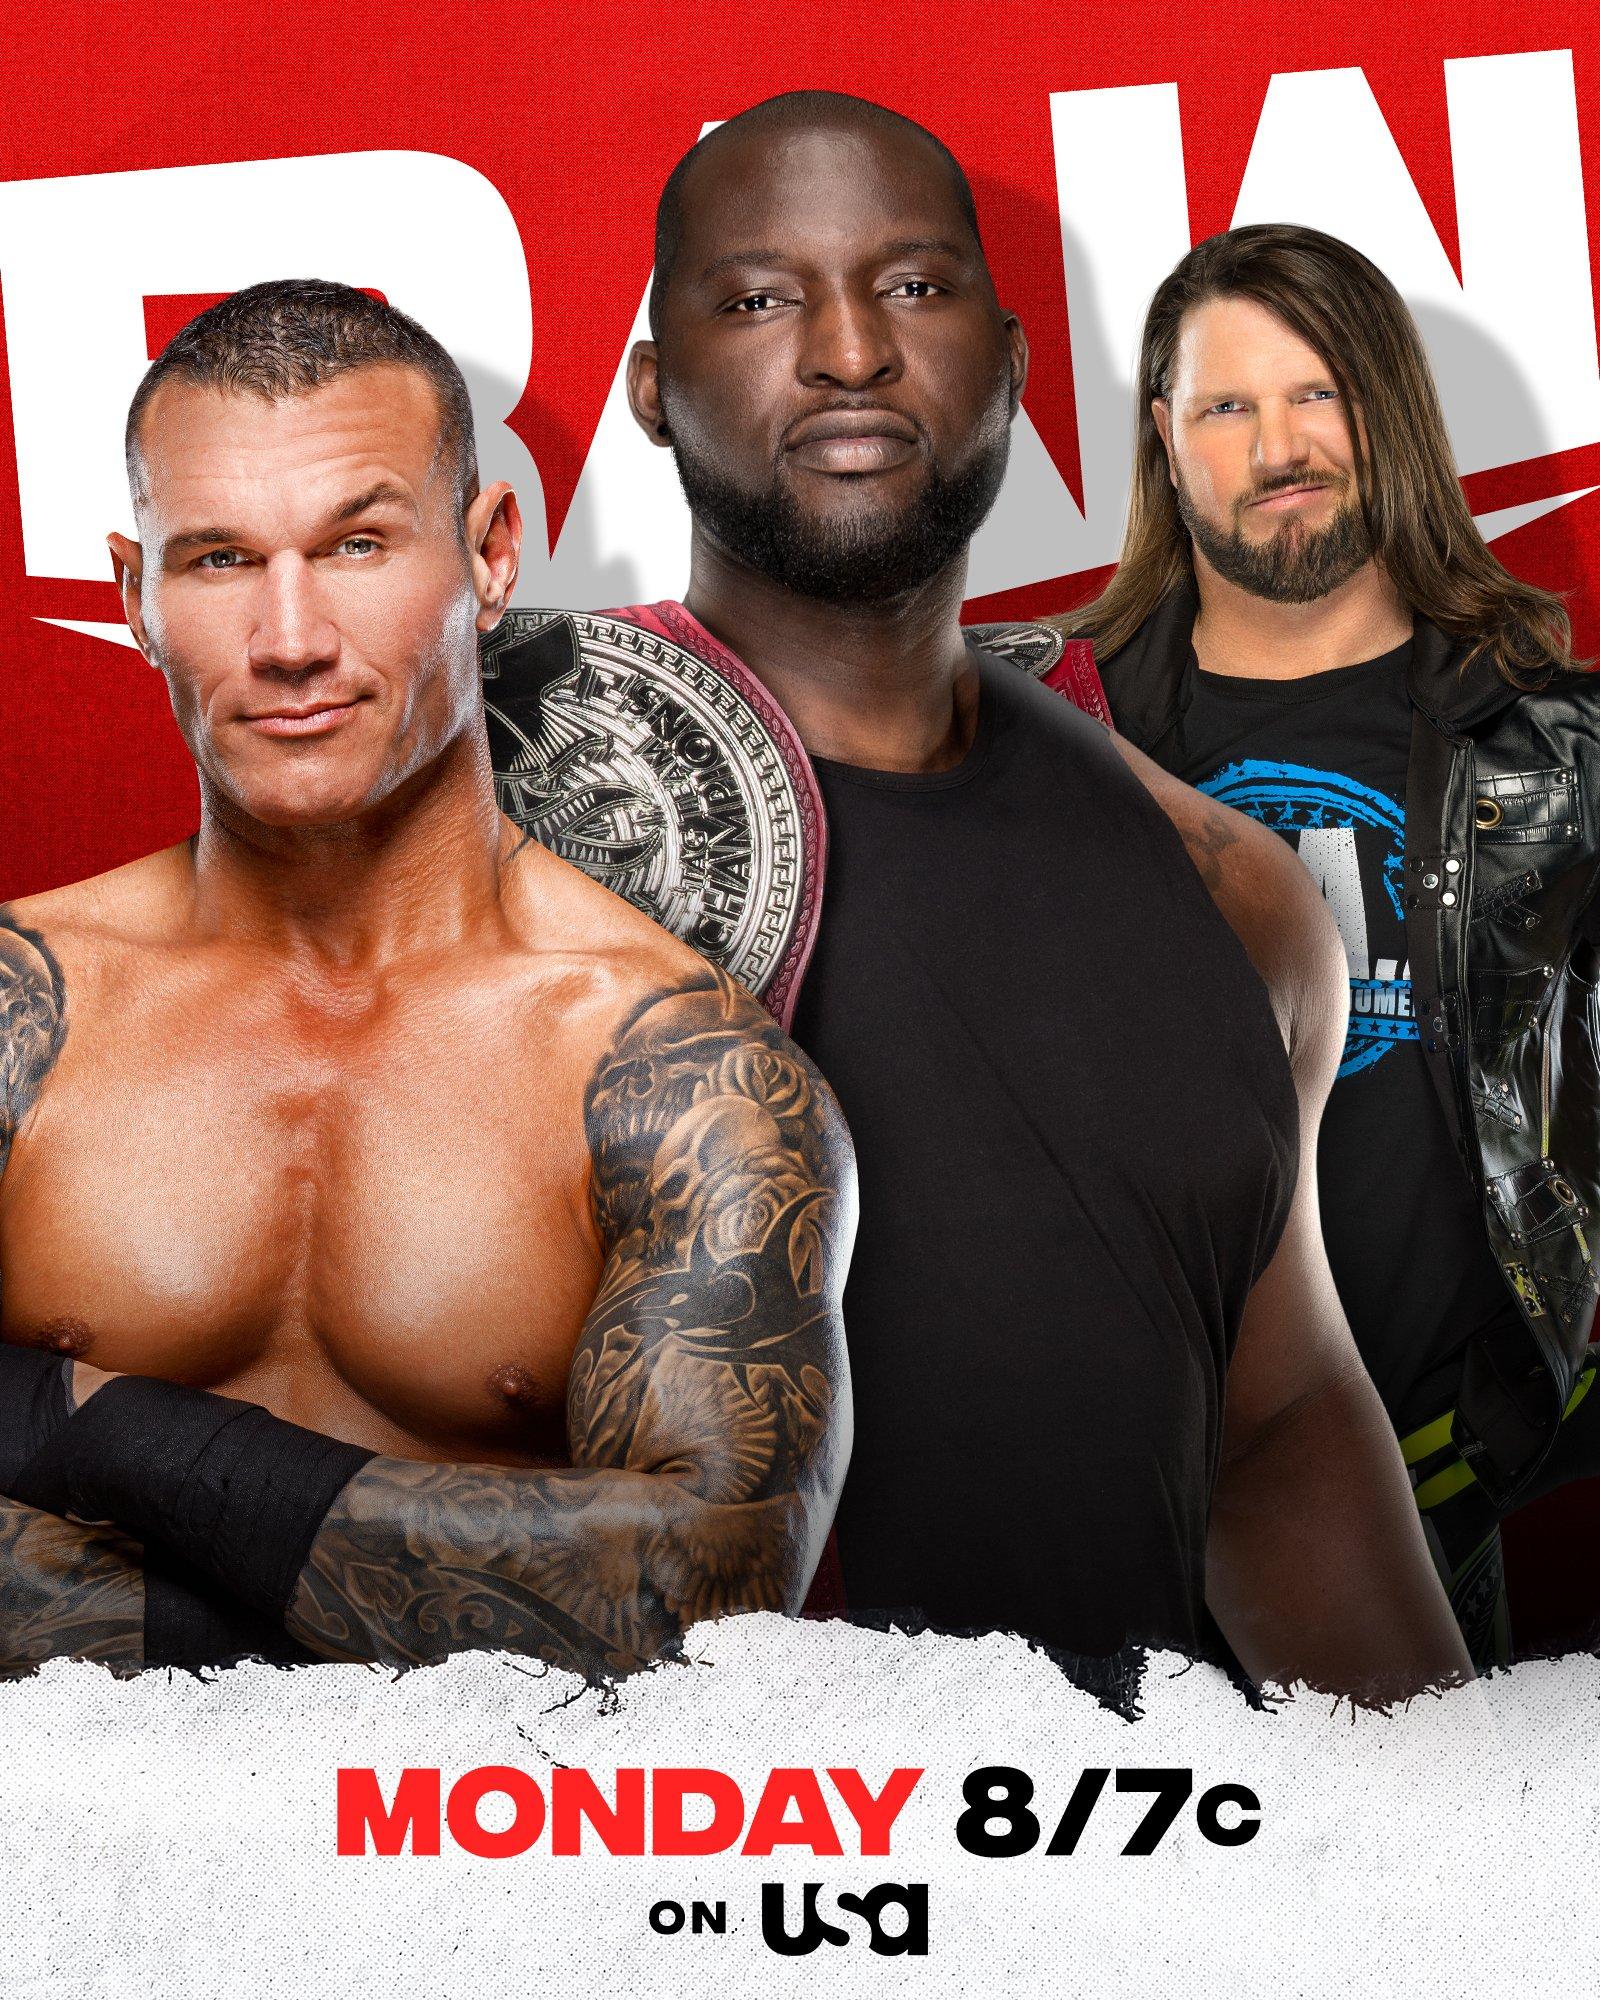 WWE Raw Preview (16/08/21): Goldberg-Lashley Face-Off; Summerslam Go-Home Show 96